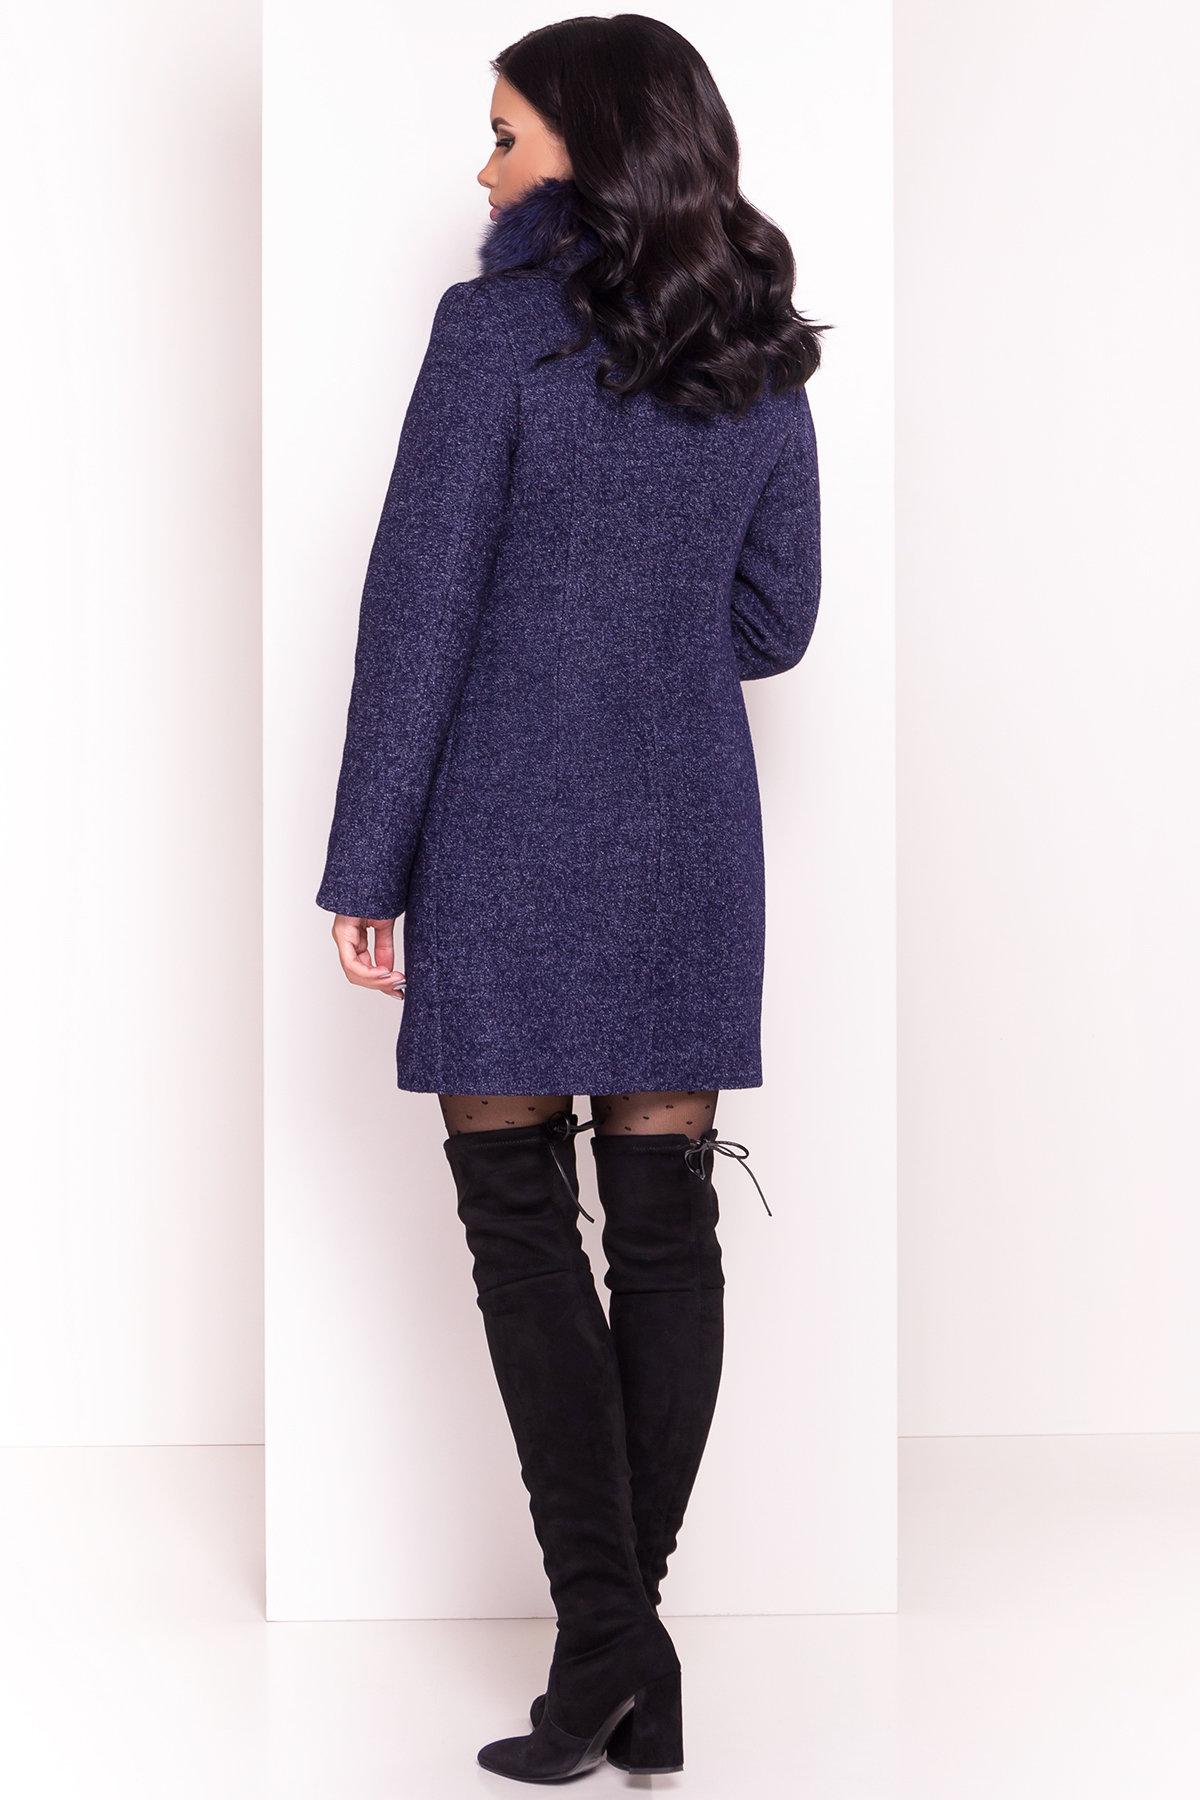 Пальто зима Сплит 3359 АРТ. 18862 Цвет: Темно-синий - фото 4, интернет магазин tm-modus.ru